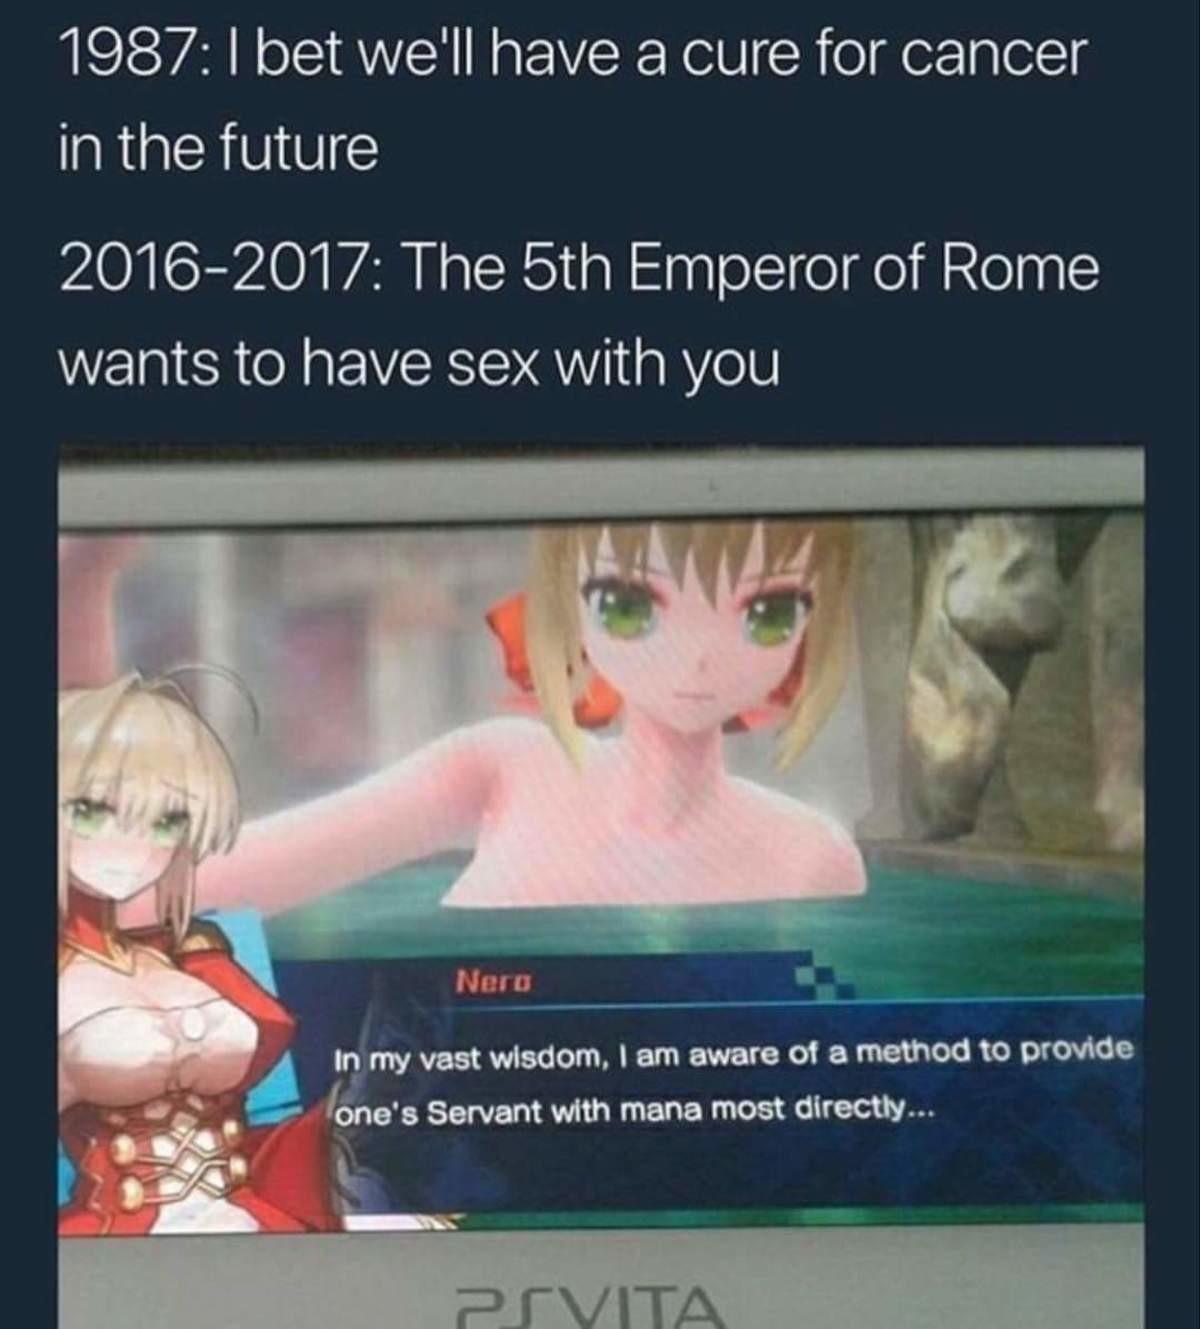 Lewd The UMU?. . in the future lvl/ ants to hal/ teii) SE) X with. >make a generic anime blob >call it nero wow japan is really greative Anime manga fate umu Nero Lewd bath